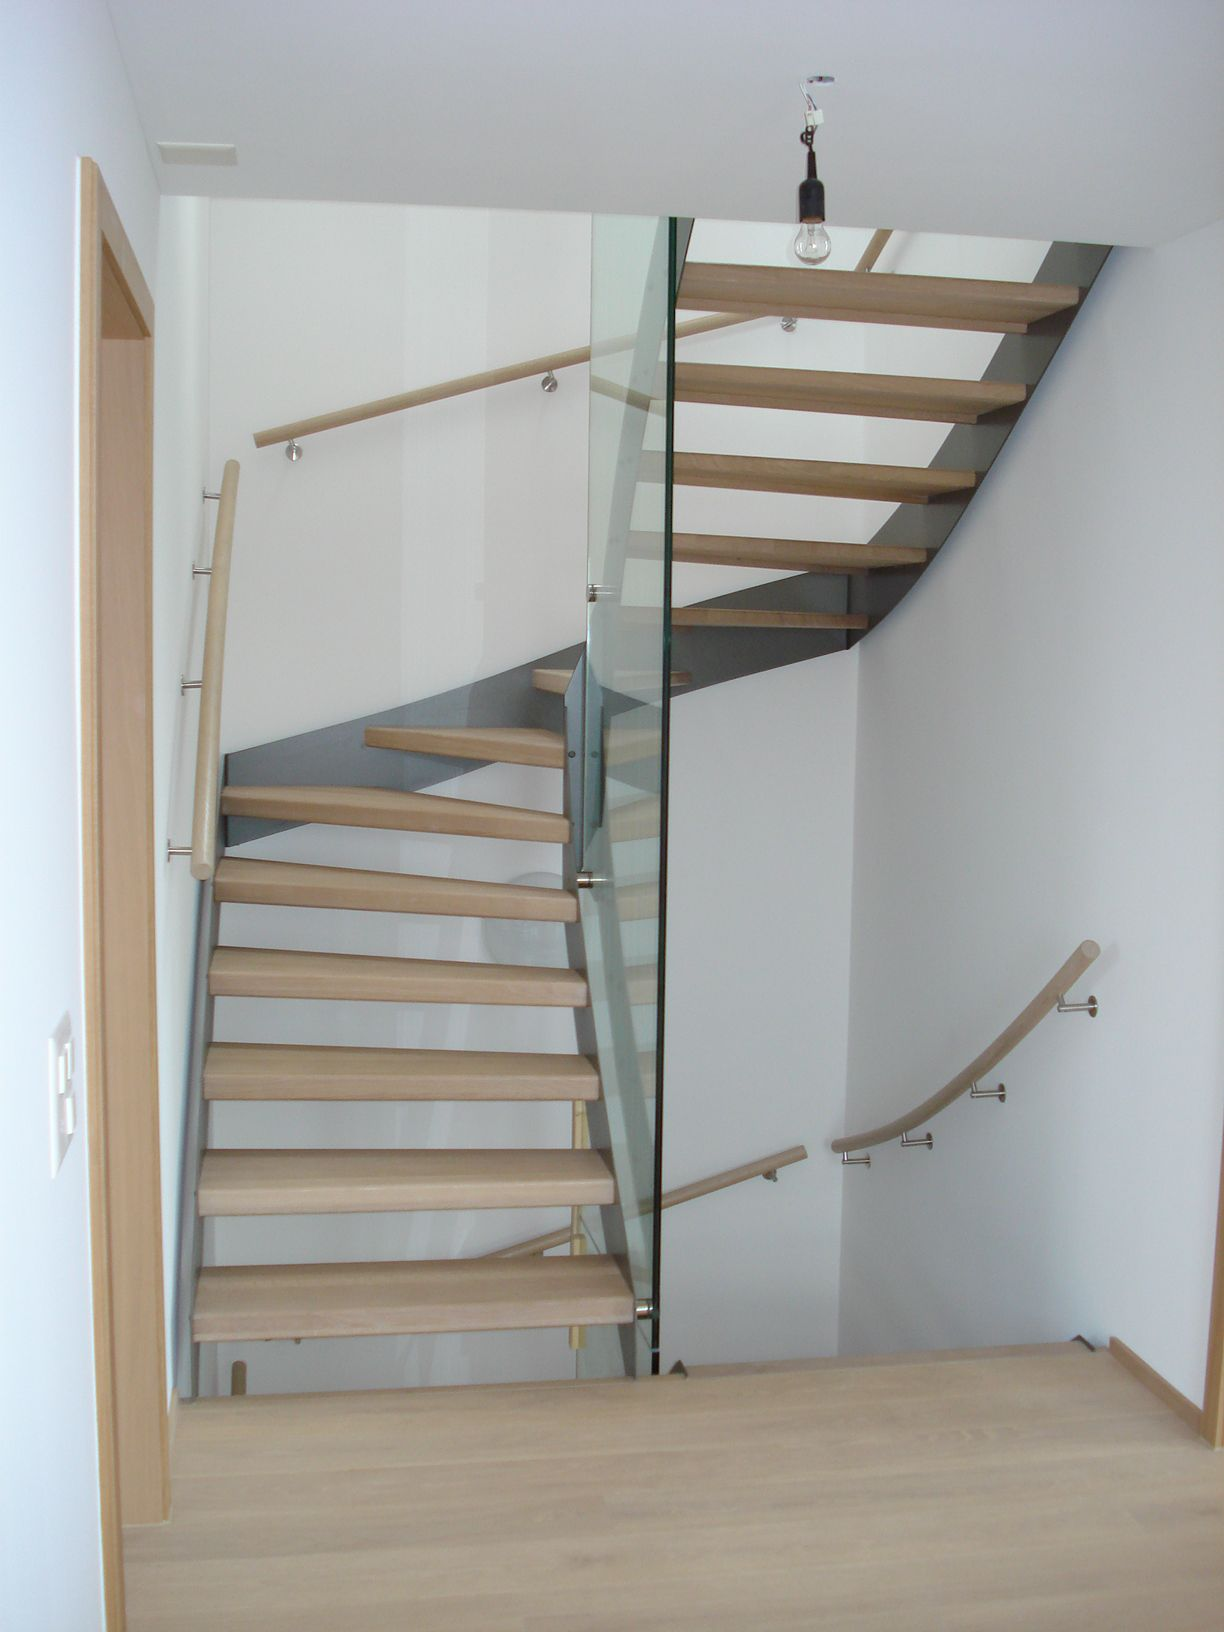 Stair Image 431